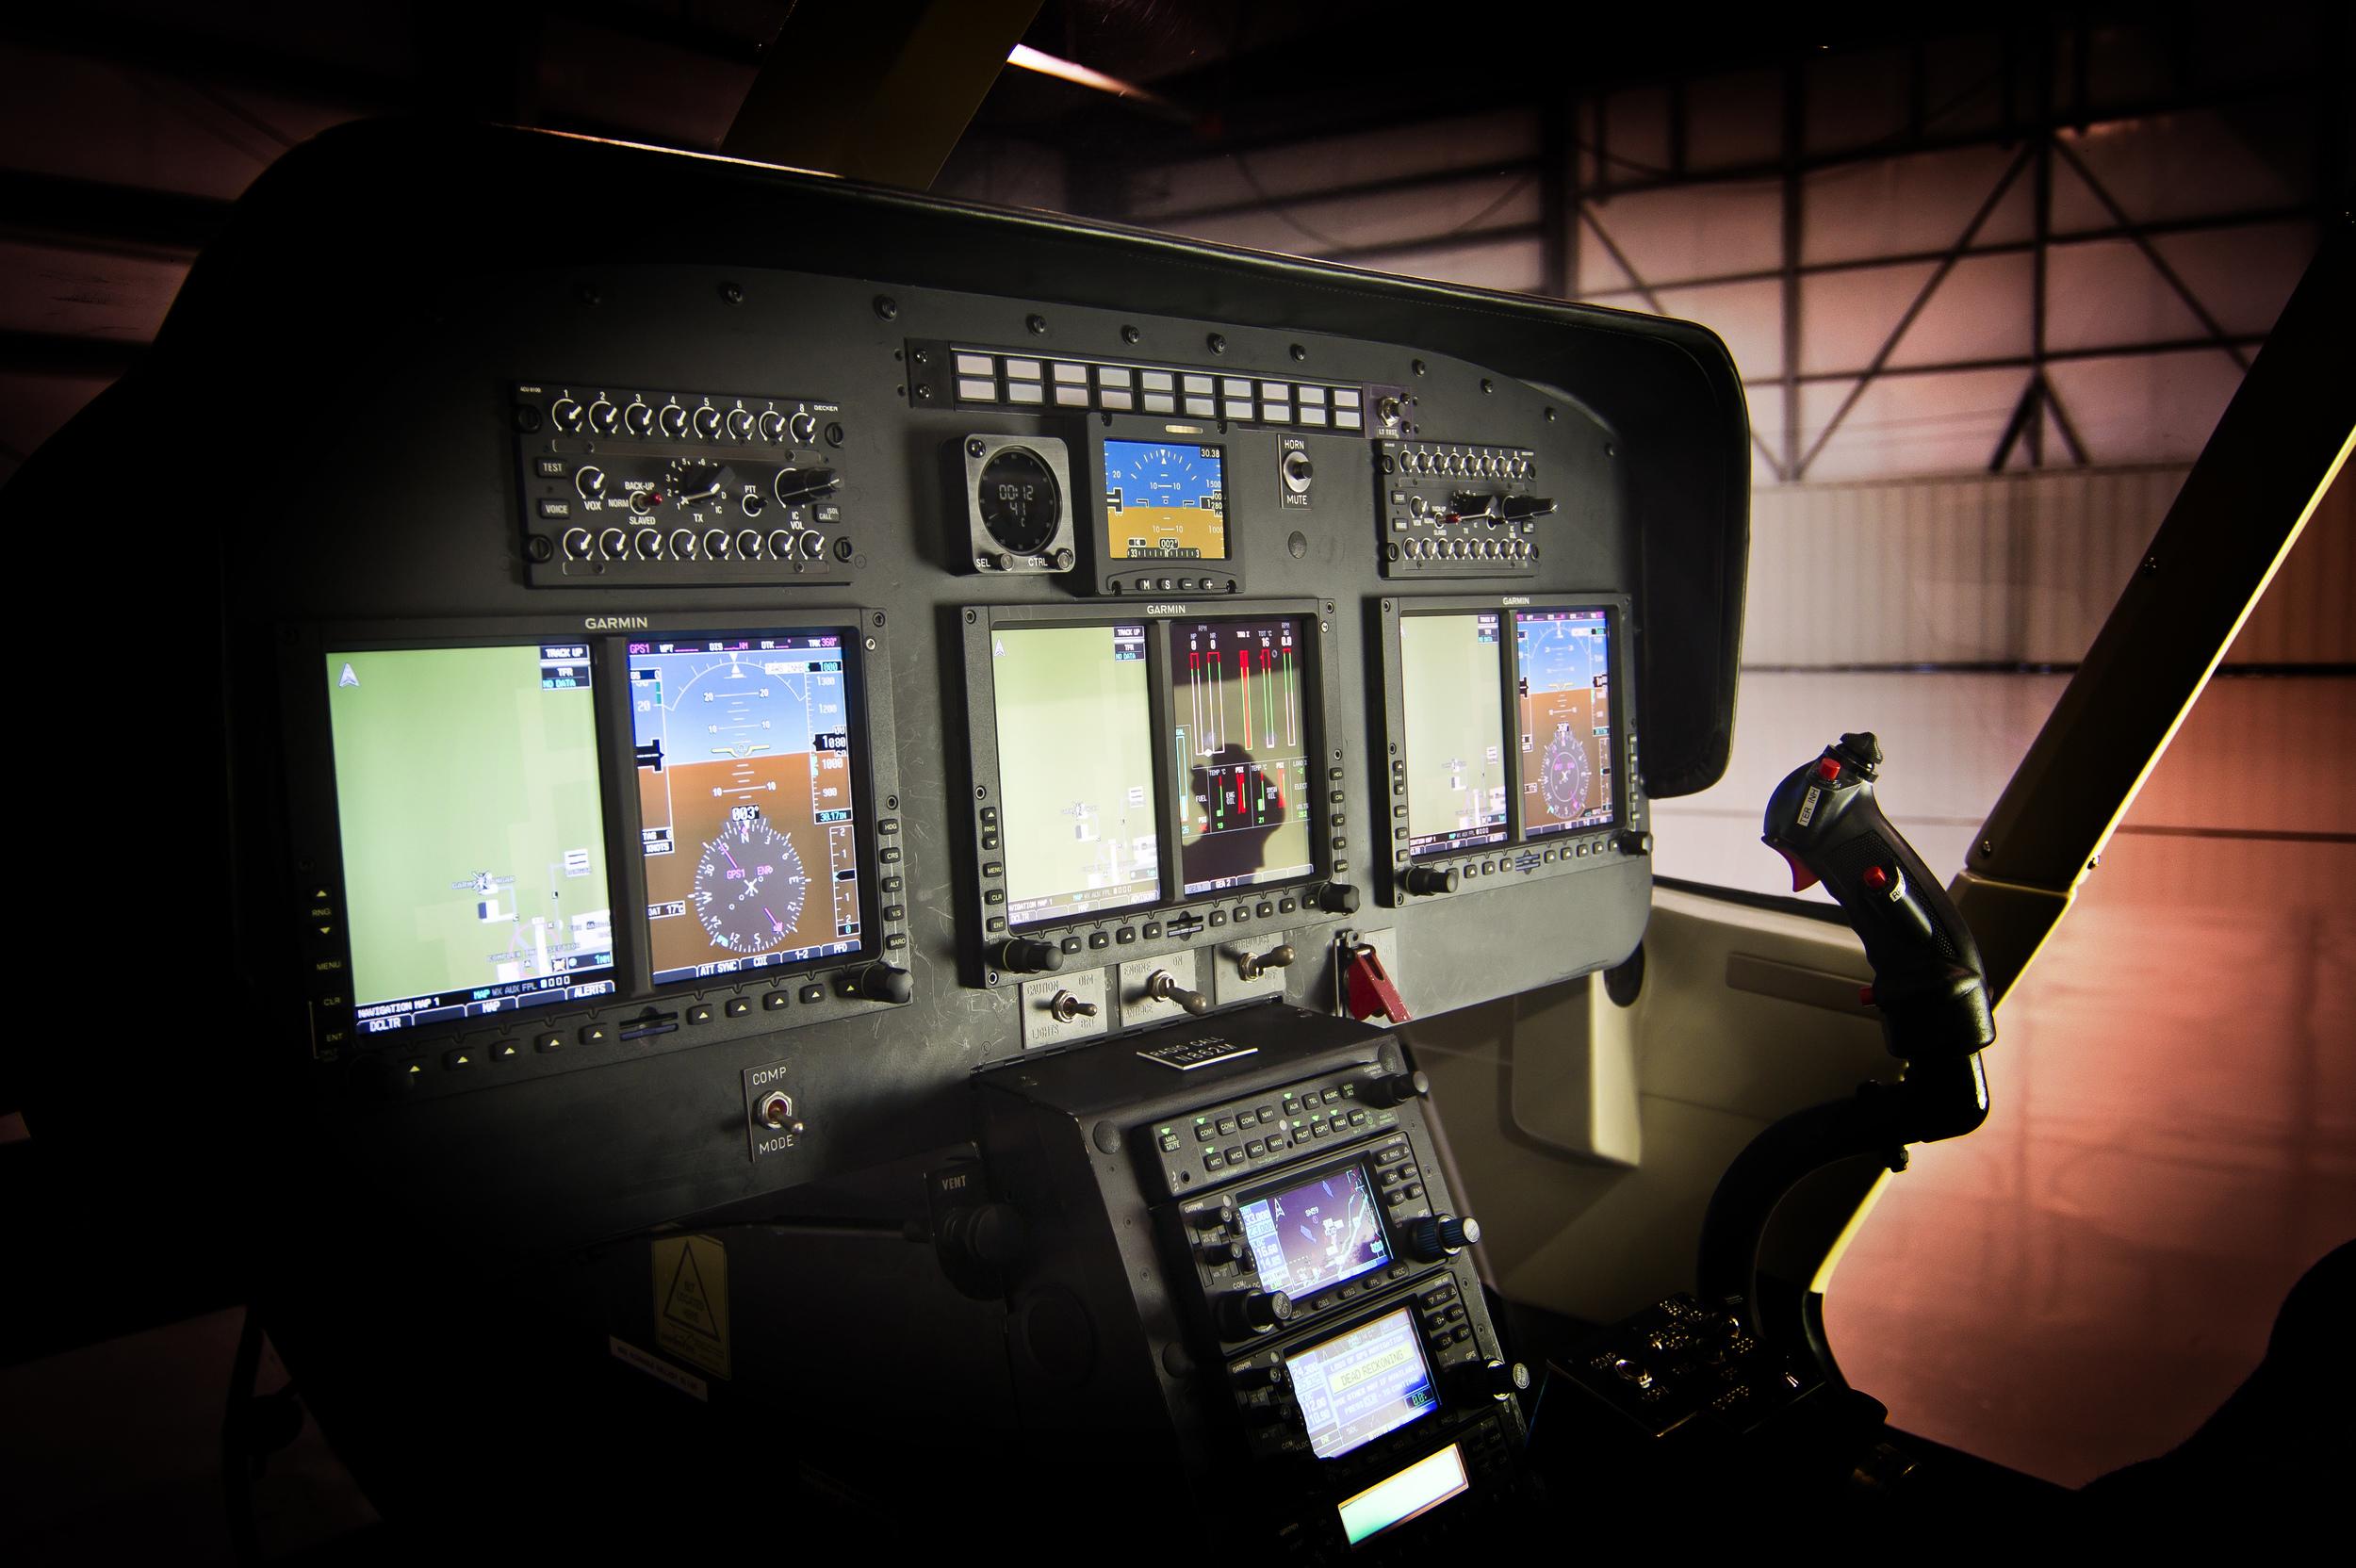 BrettSmith-Garmin-Helicopter7.jpg